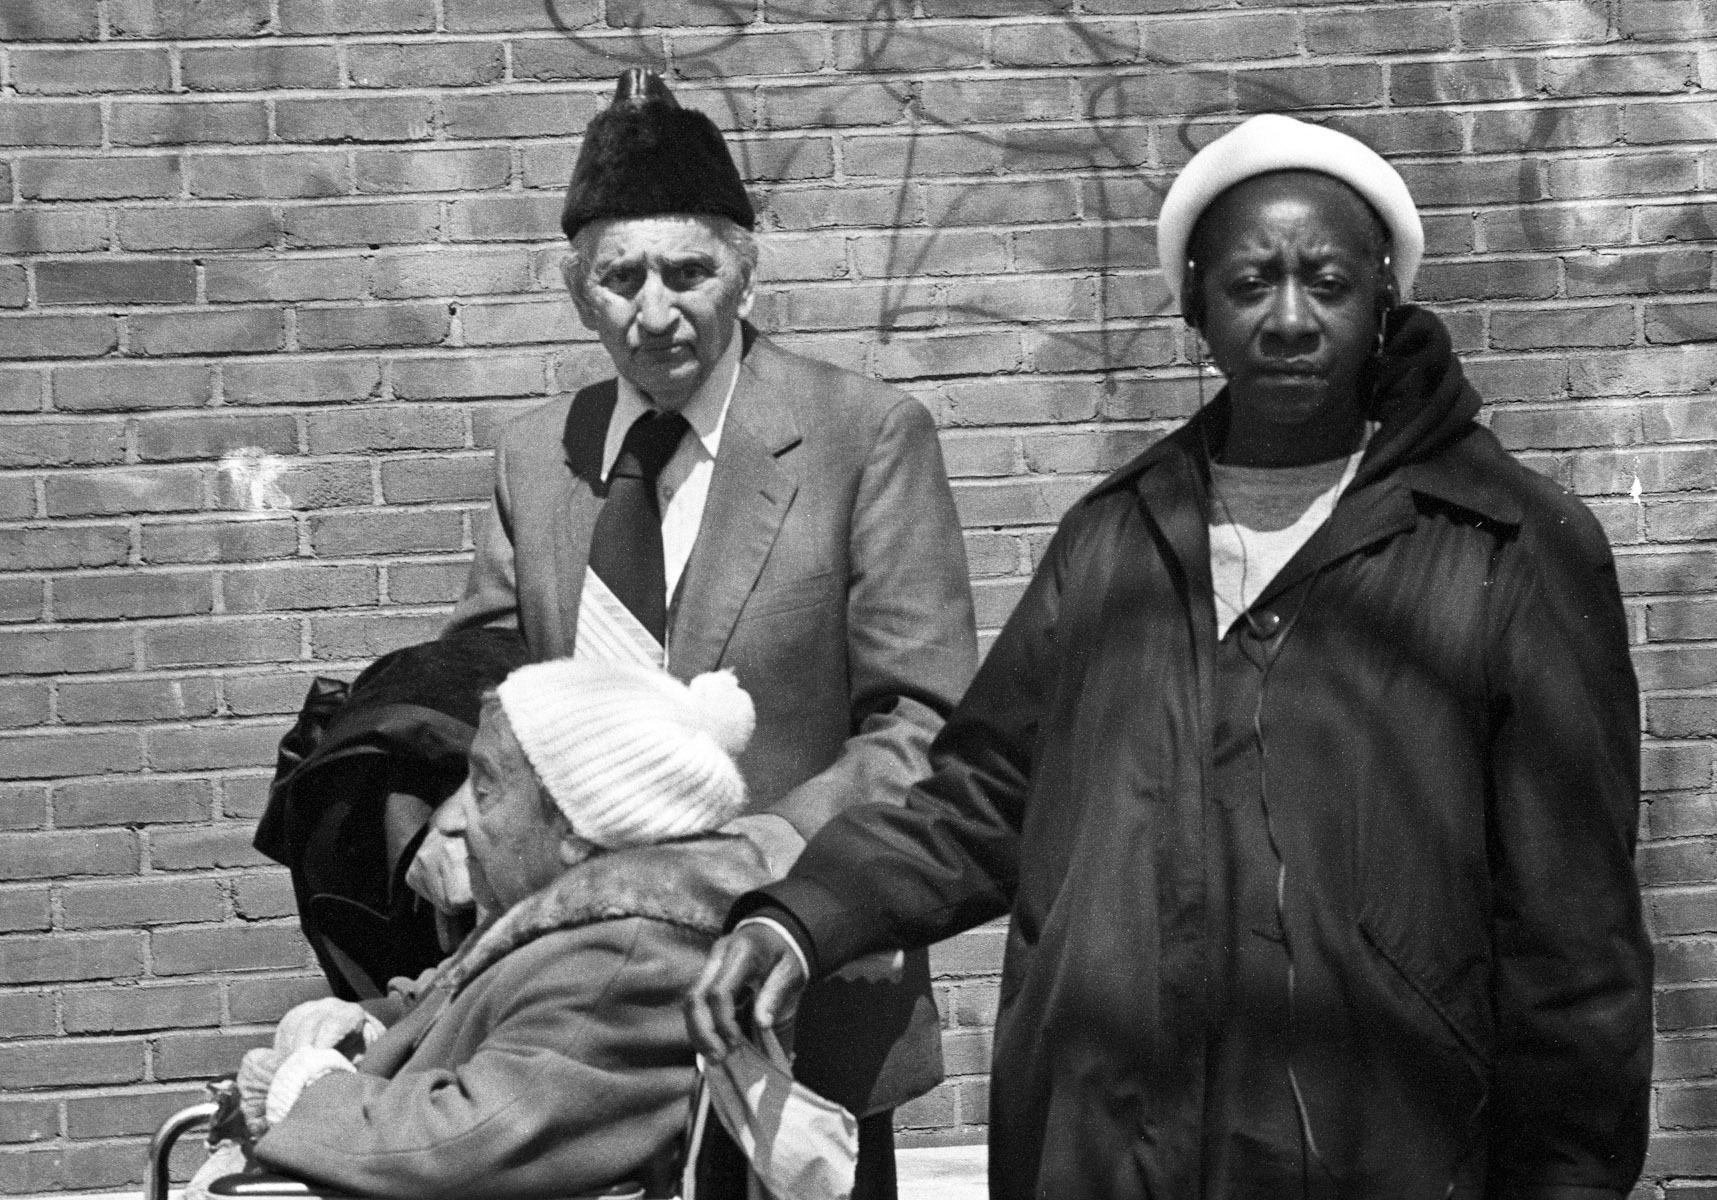 Lower East Side, New York 05/01/94